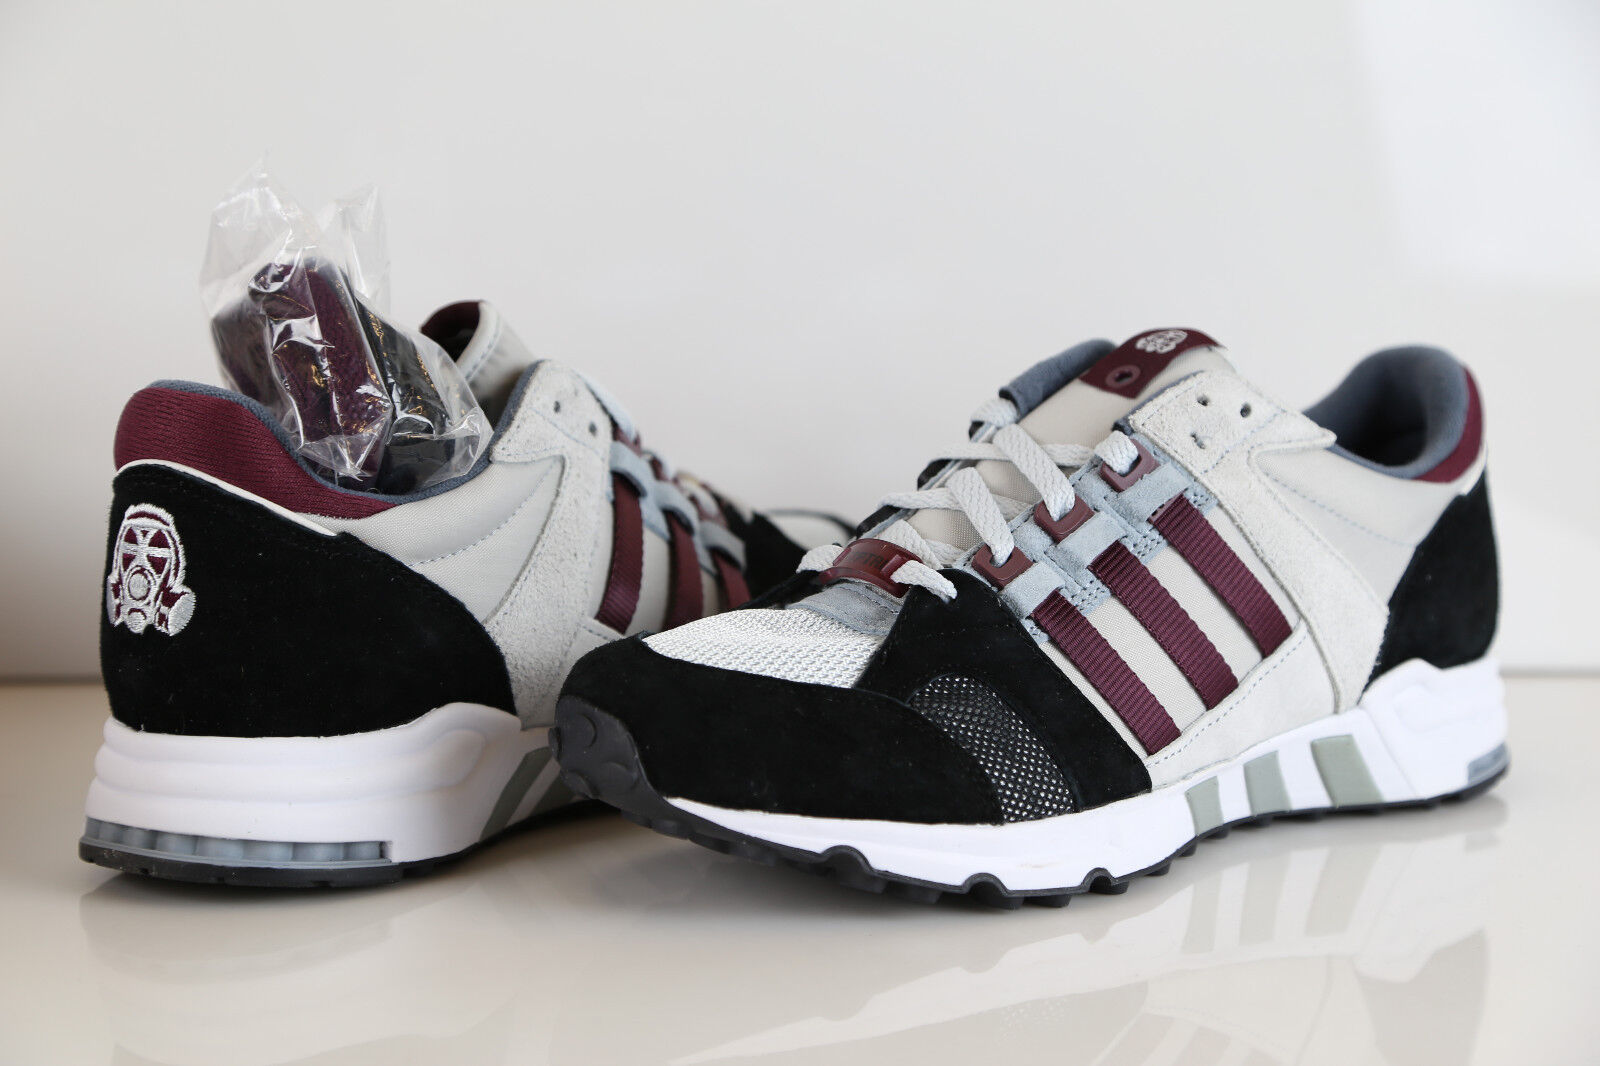 Adidas FootPatrol Consortium EQT Equipment Running Cushion 93 S80568 8-12.5 rf 1